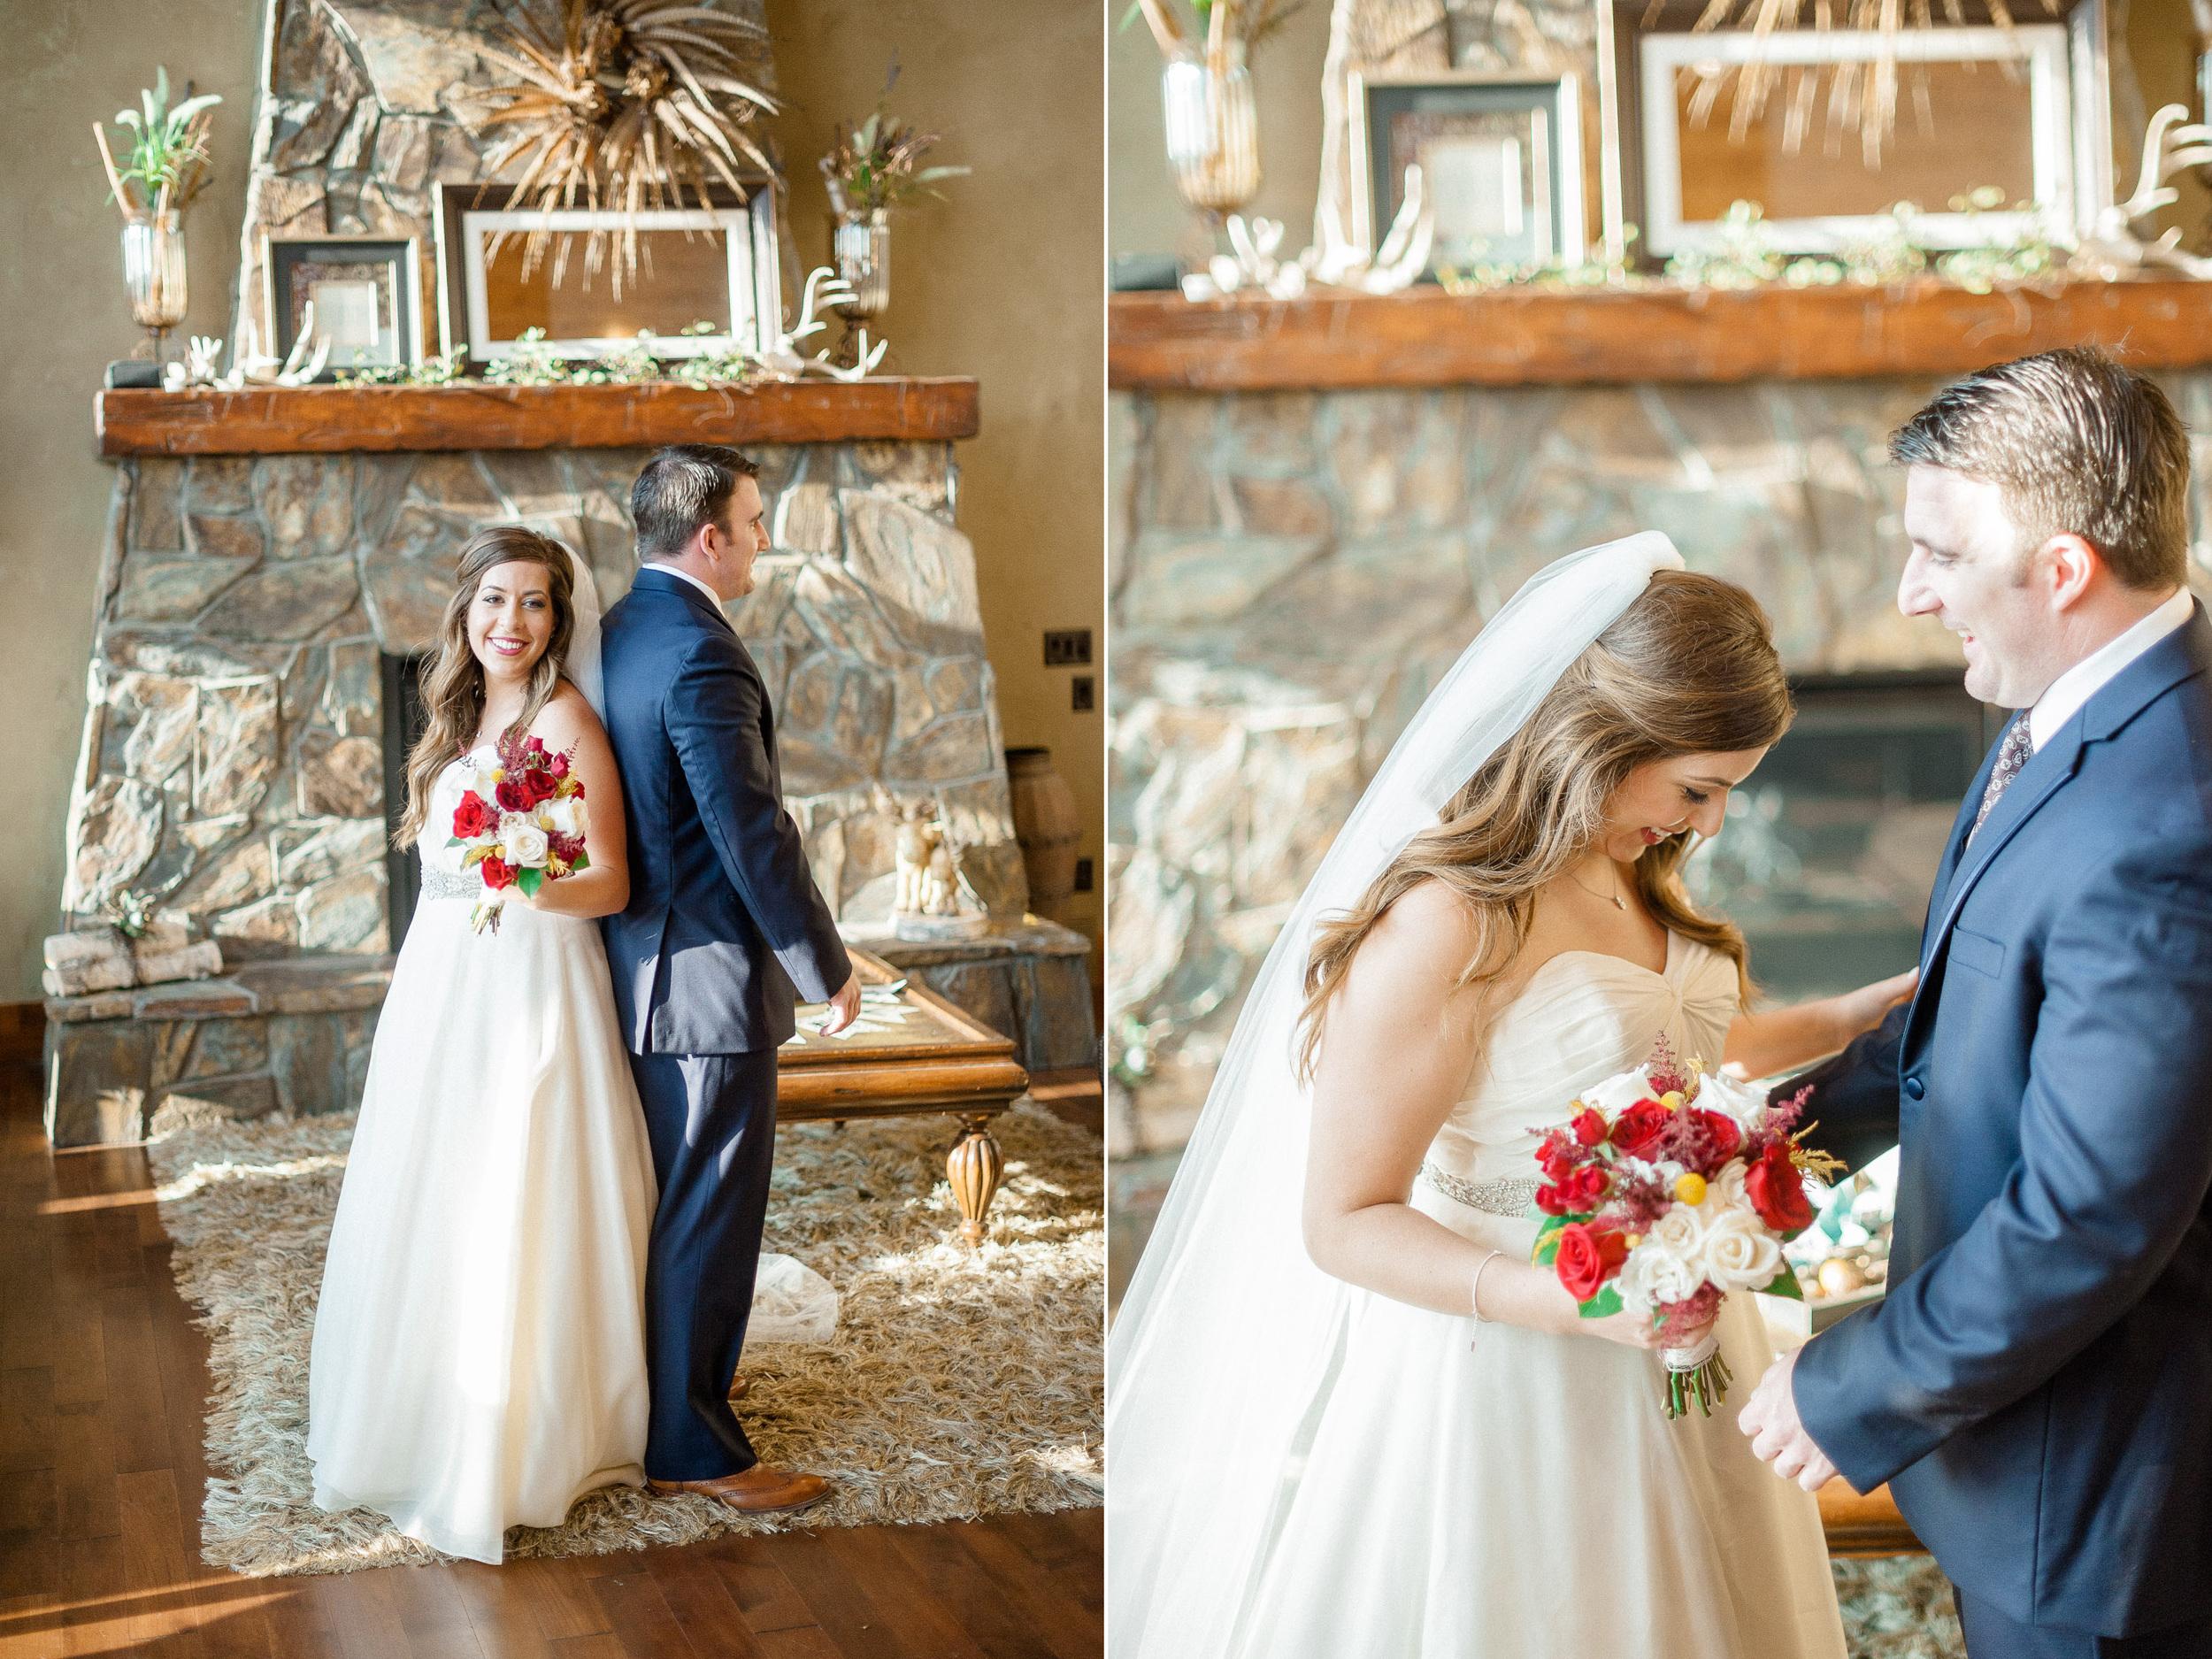 Alyssa and Kyle Wedding-17.jpg